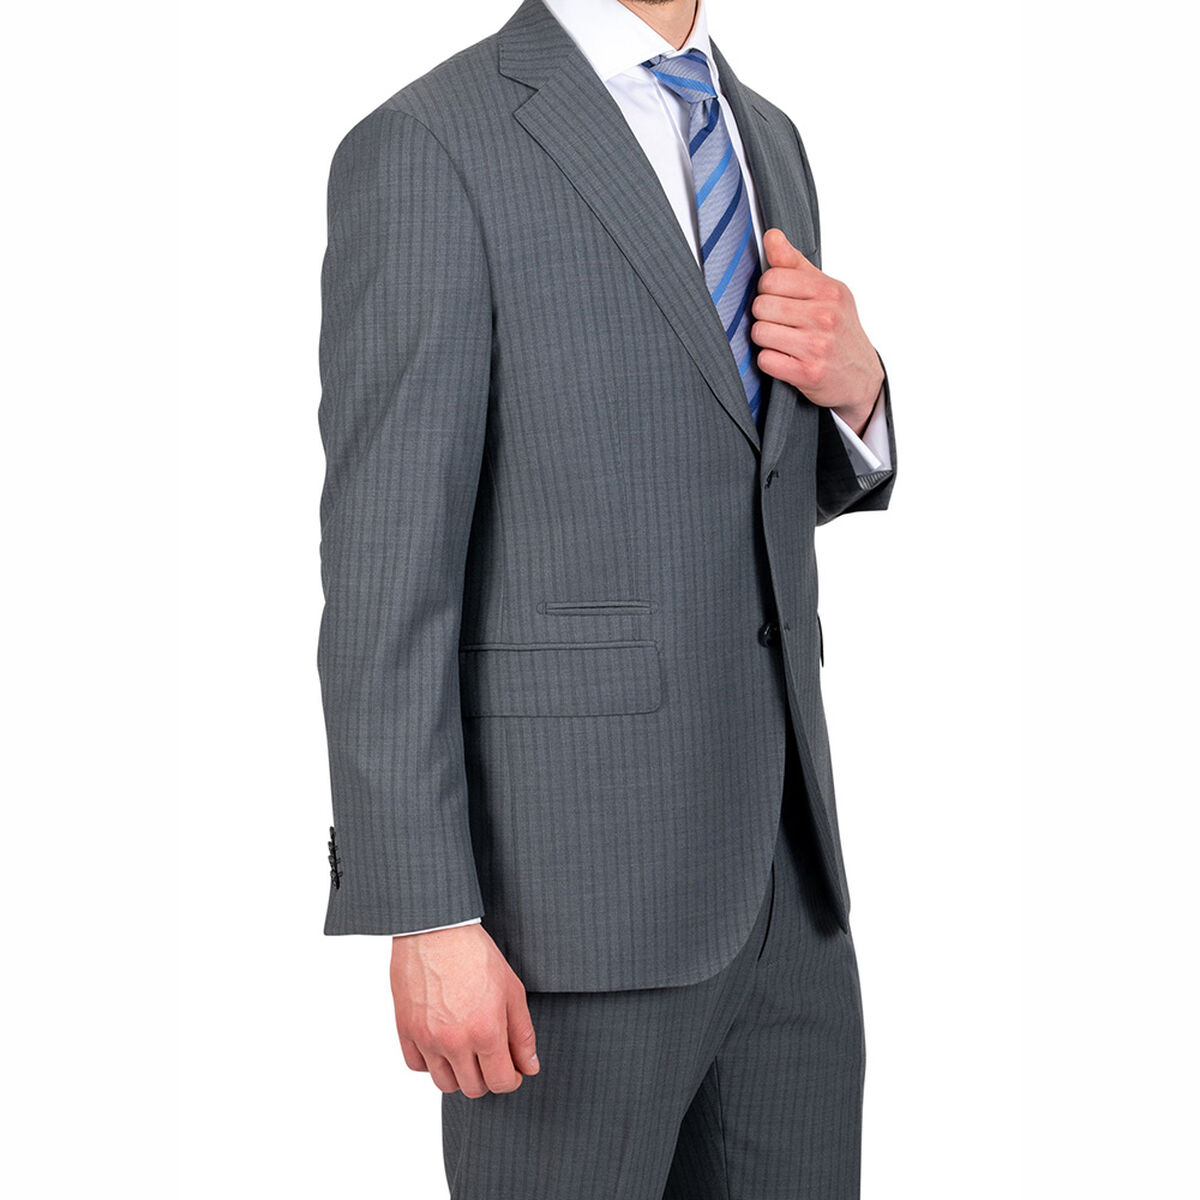 Traje Hombre Trial Executive